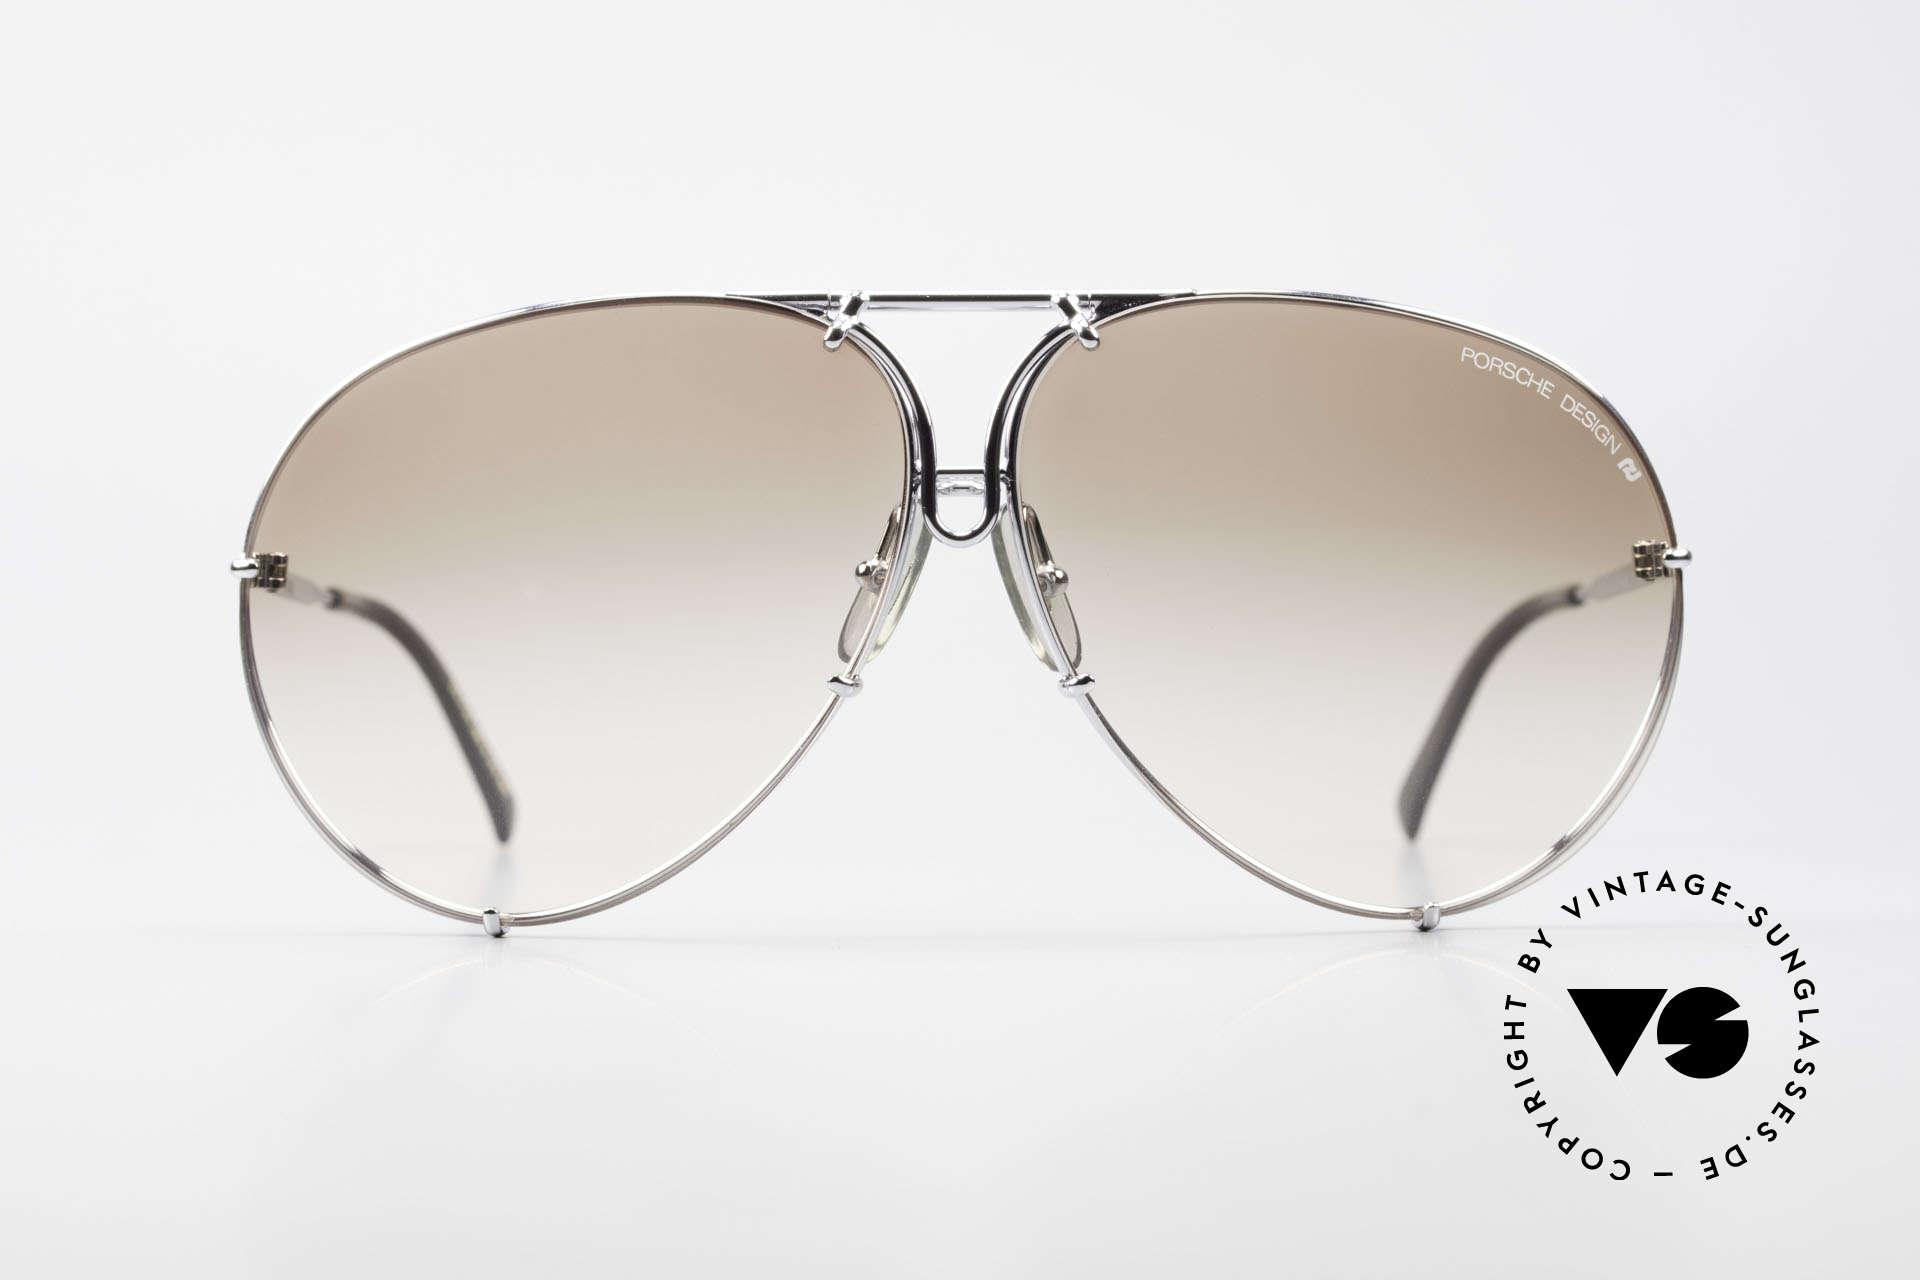 Porsche 5621 80's Sunglass Classic For Men, a true sunglass' classic for men in chrome-silver, Made for Men